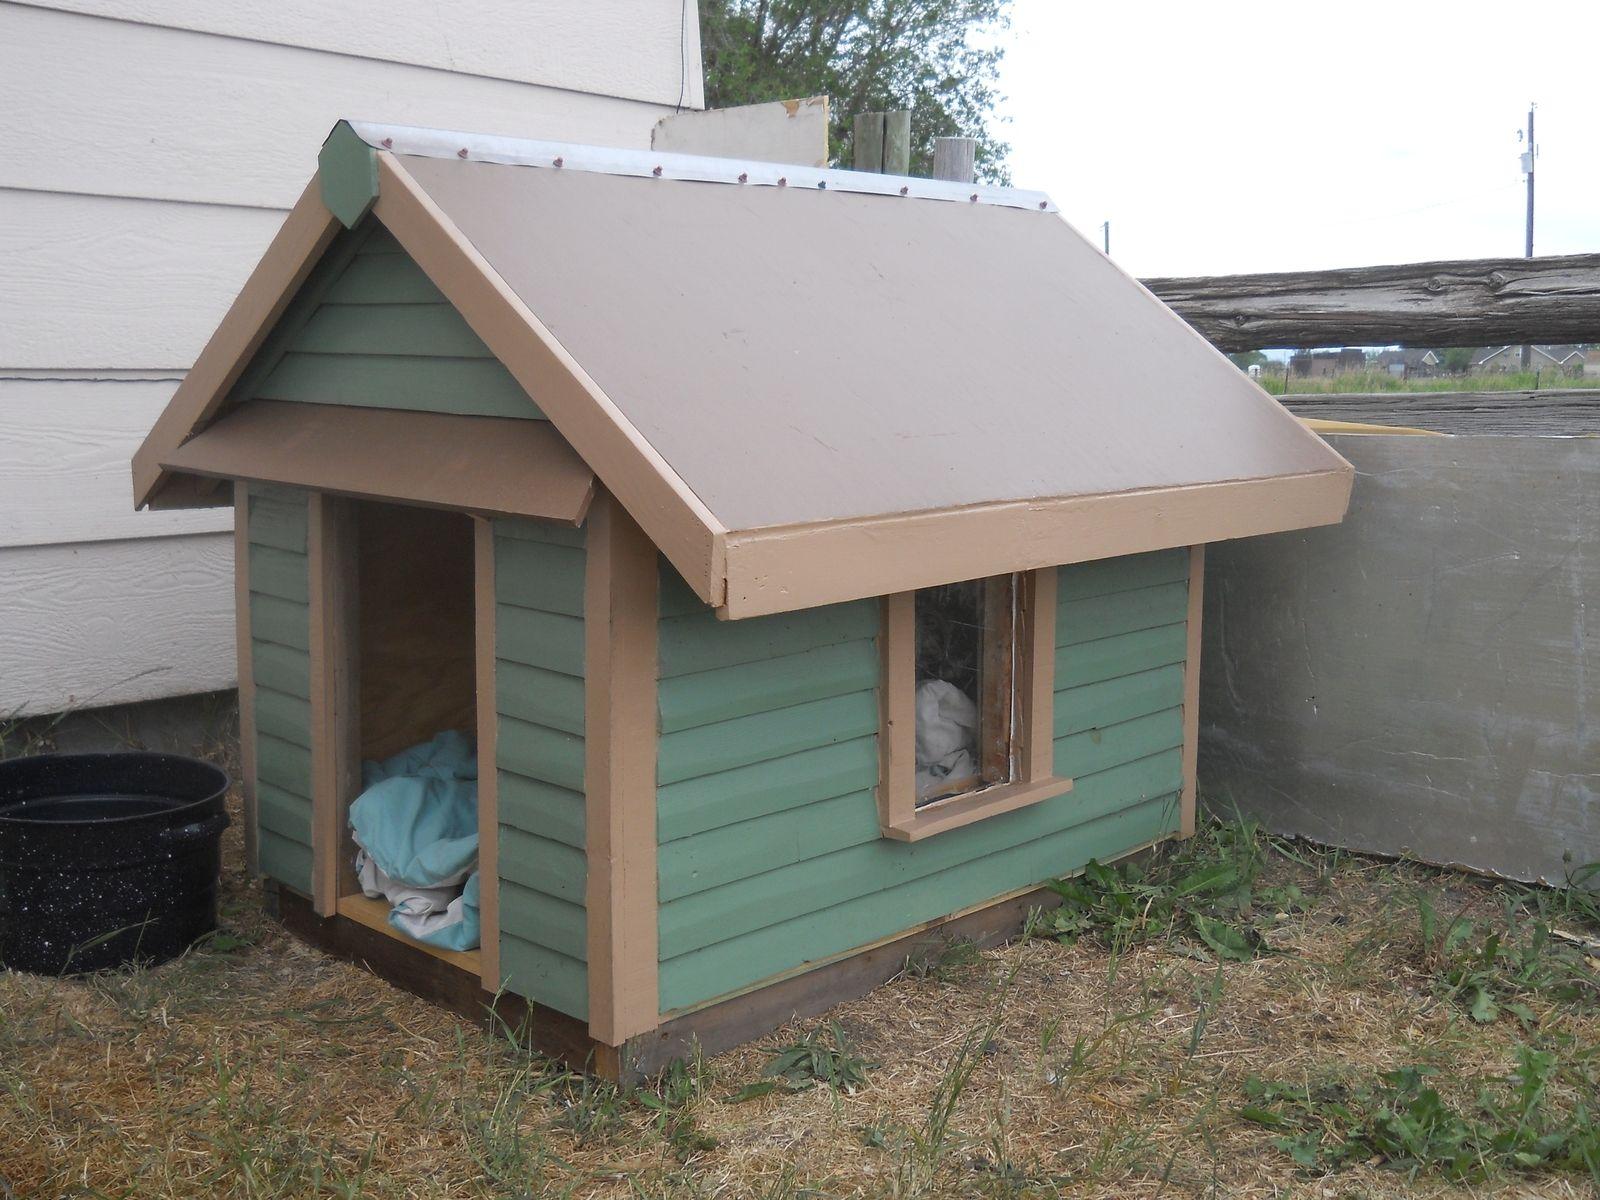 Handmade the dog house by cyndel o d p e r elkhorn for Niche siding